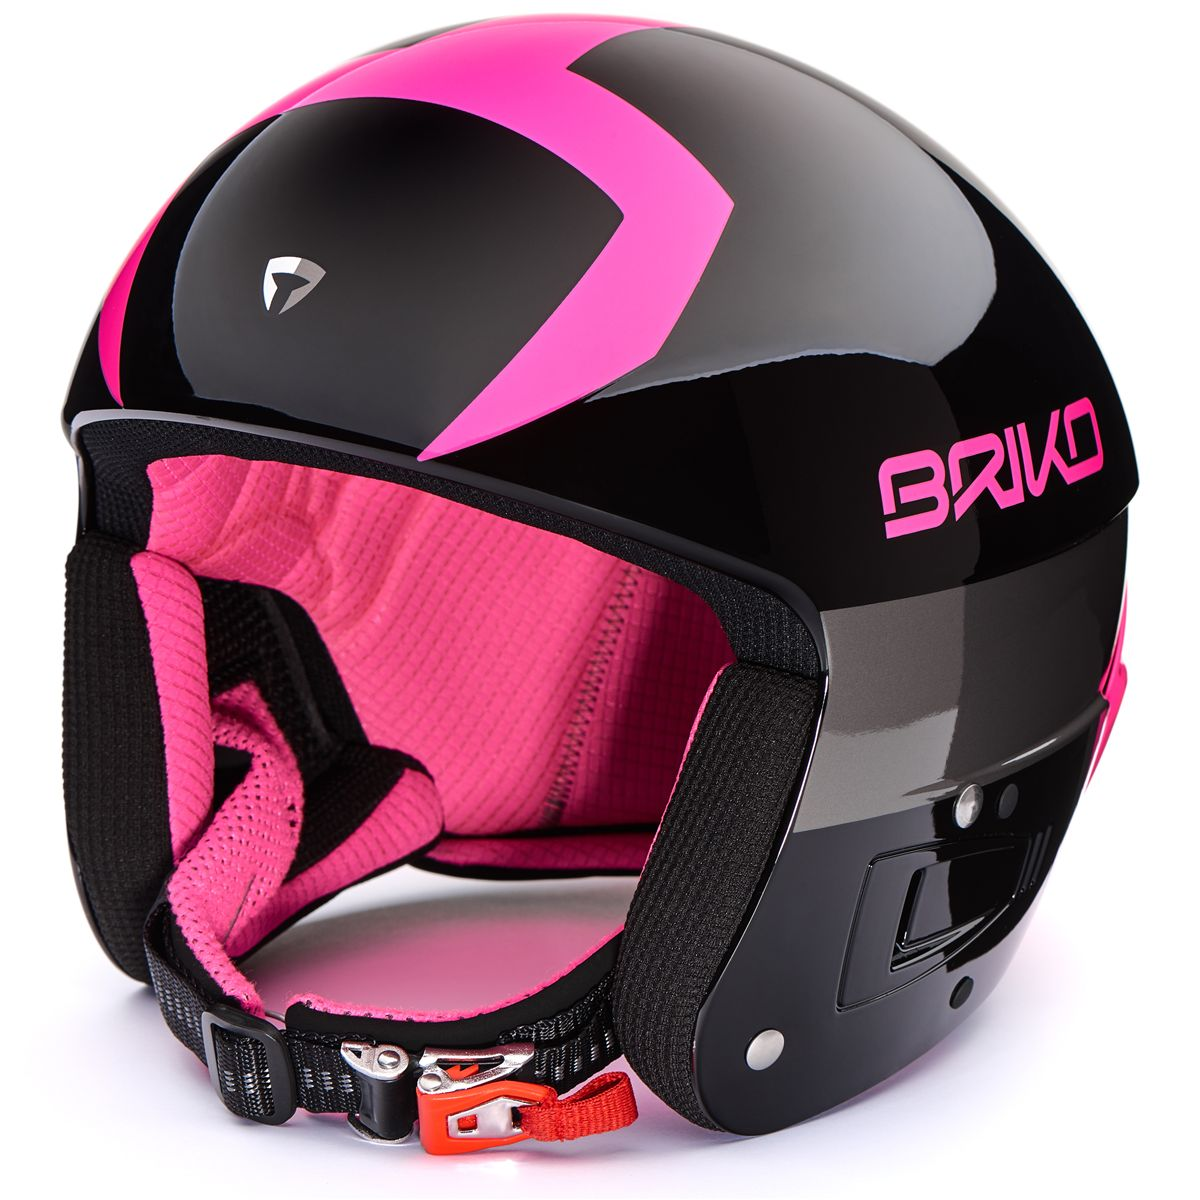 Briko Caschi uomo-2000020